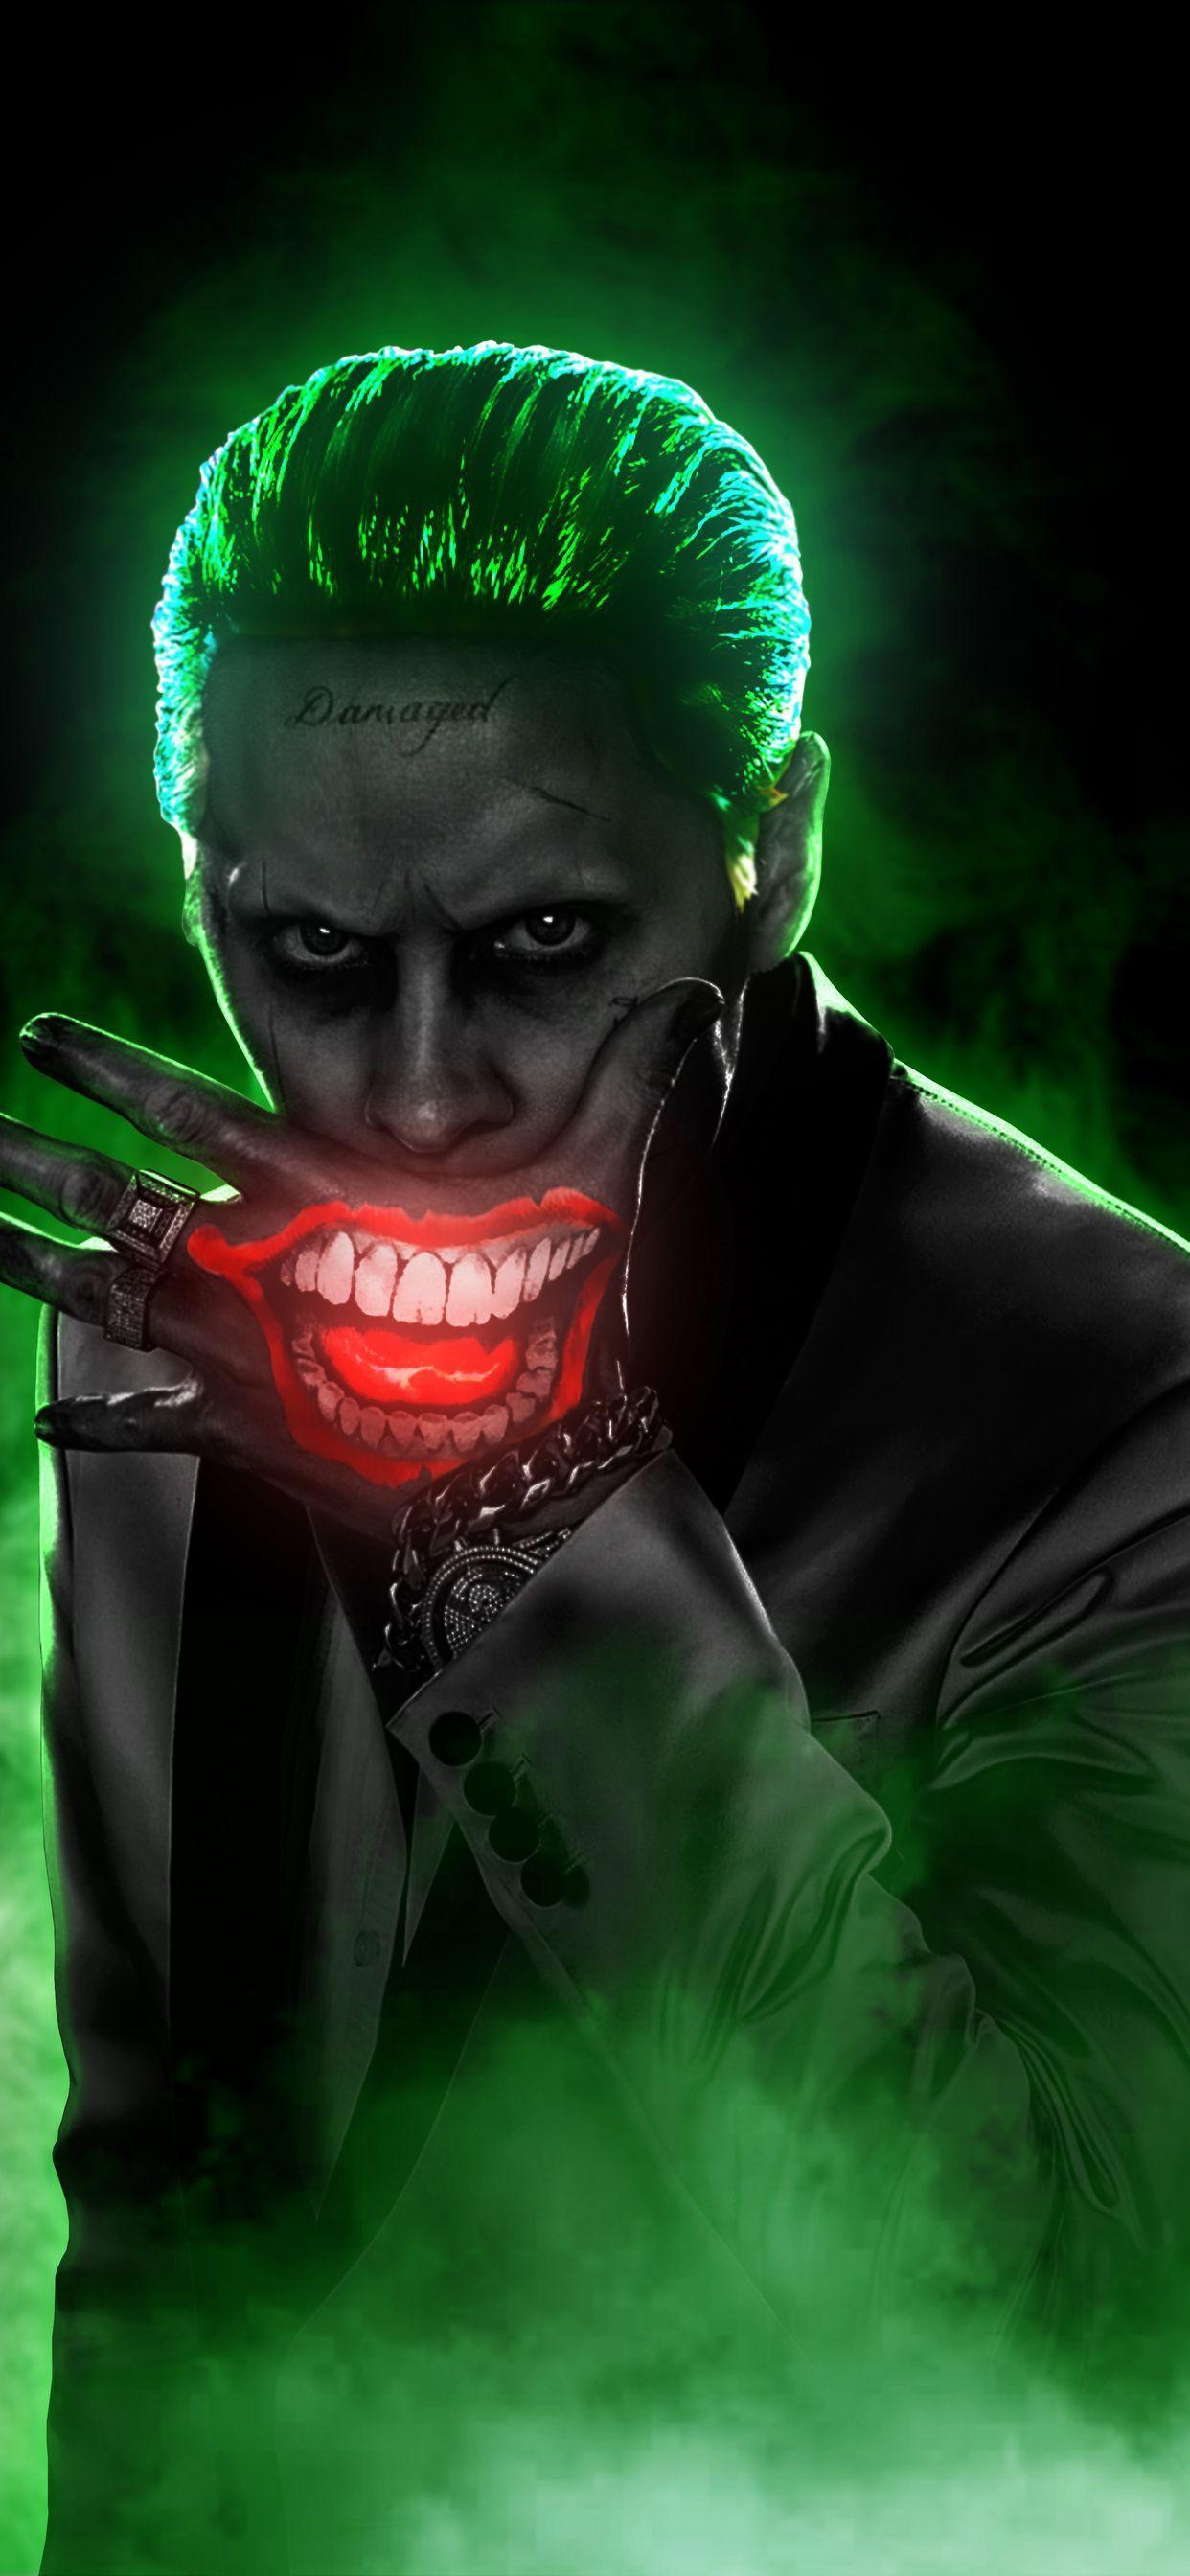 Joker Aesthetic Wallpapers Top Free Joker Aesthetic Backgrounds Wallpaperaccess